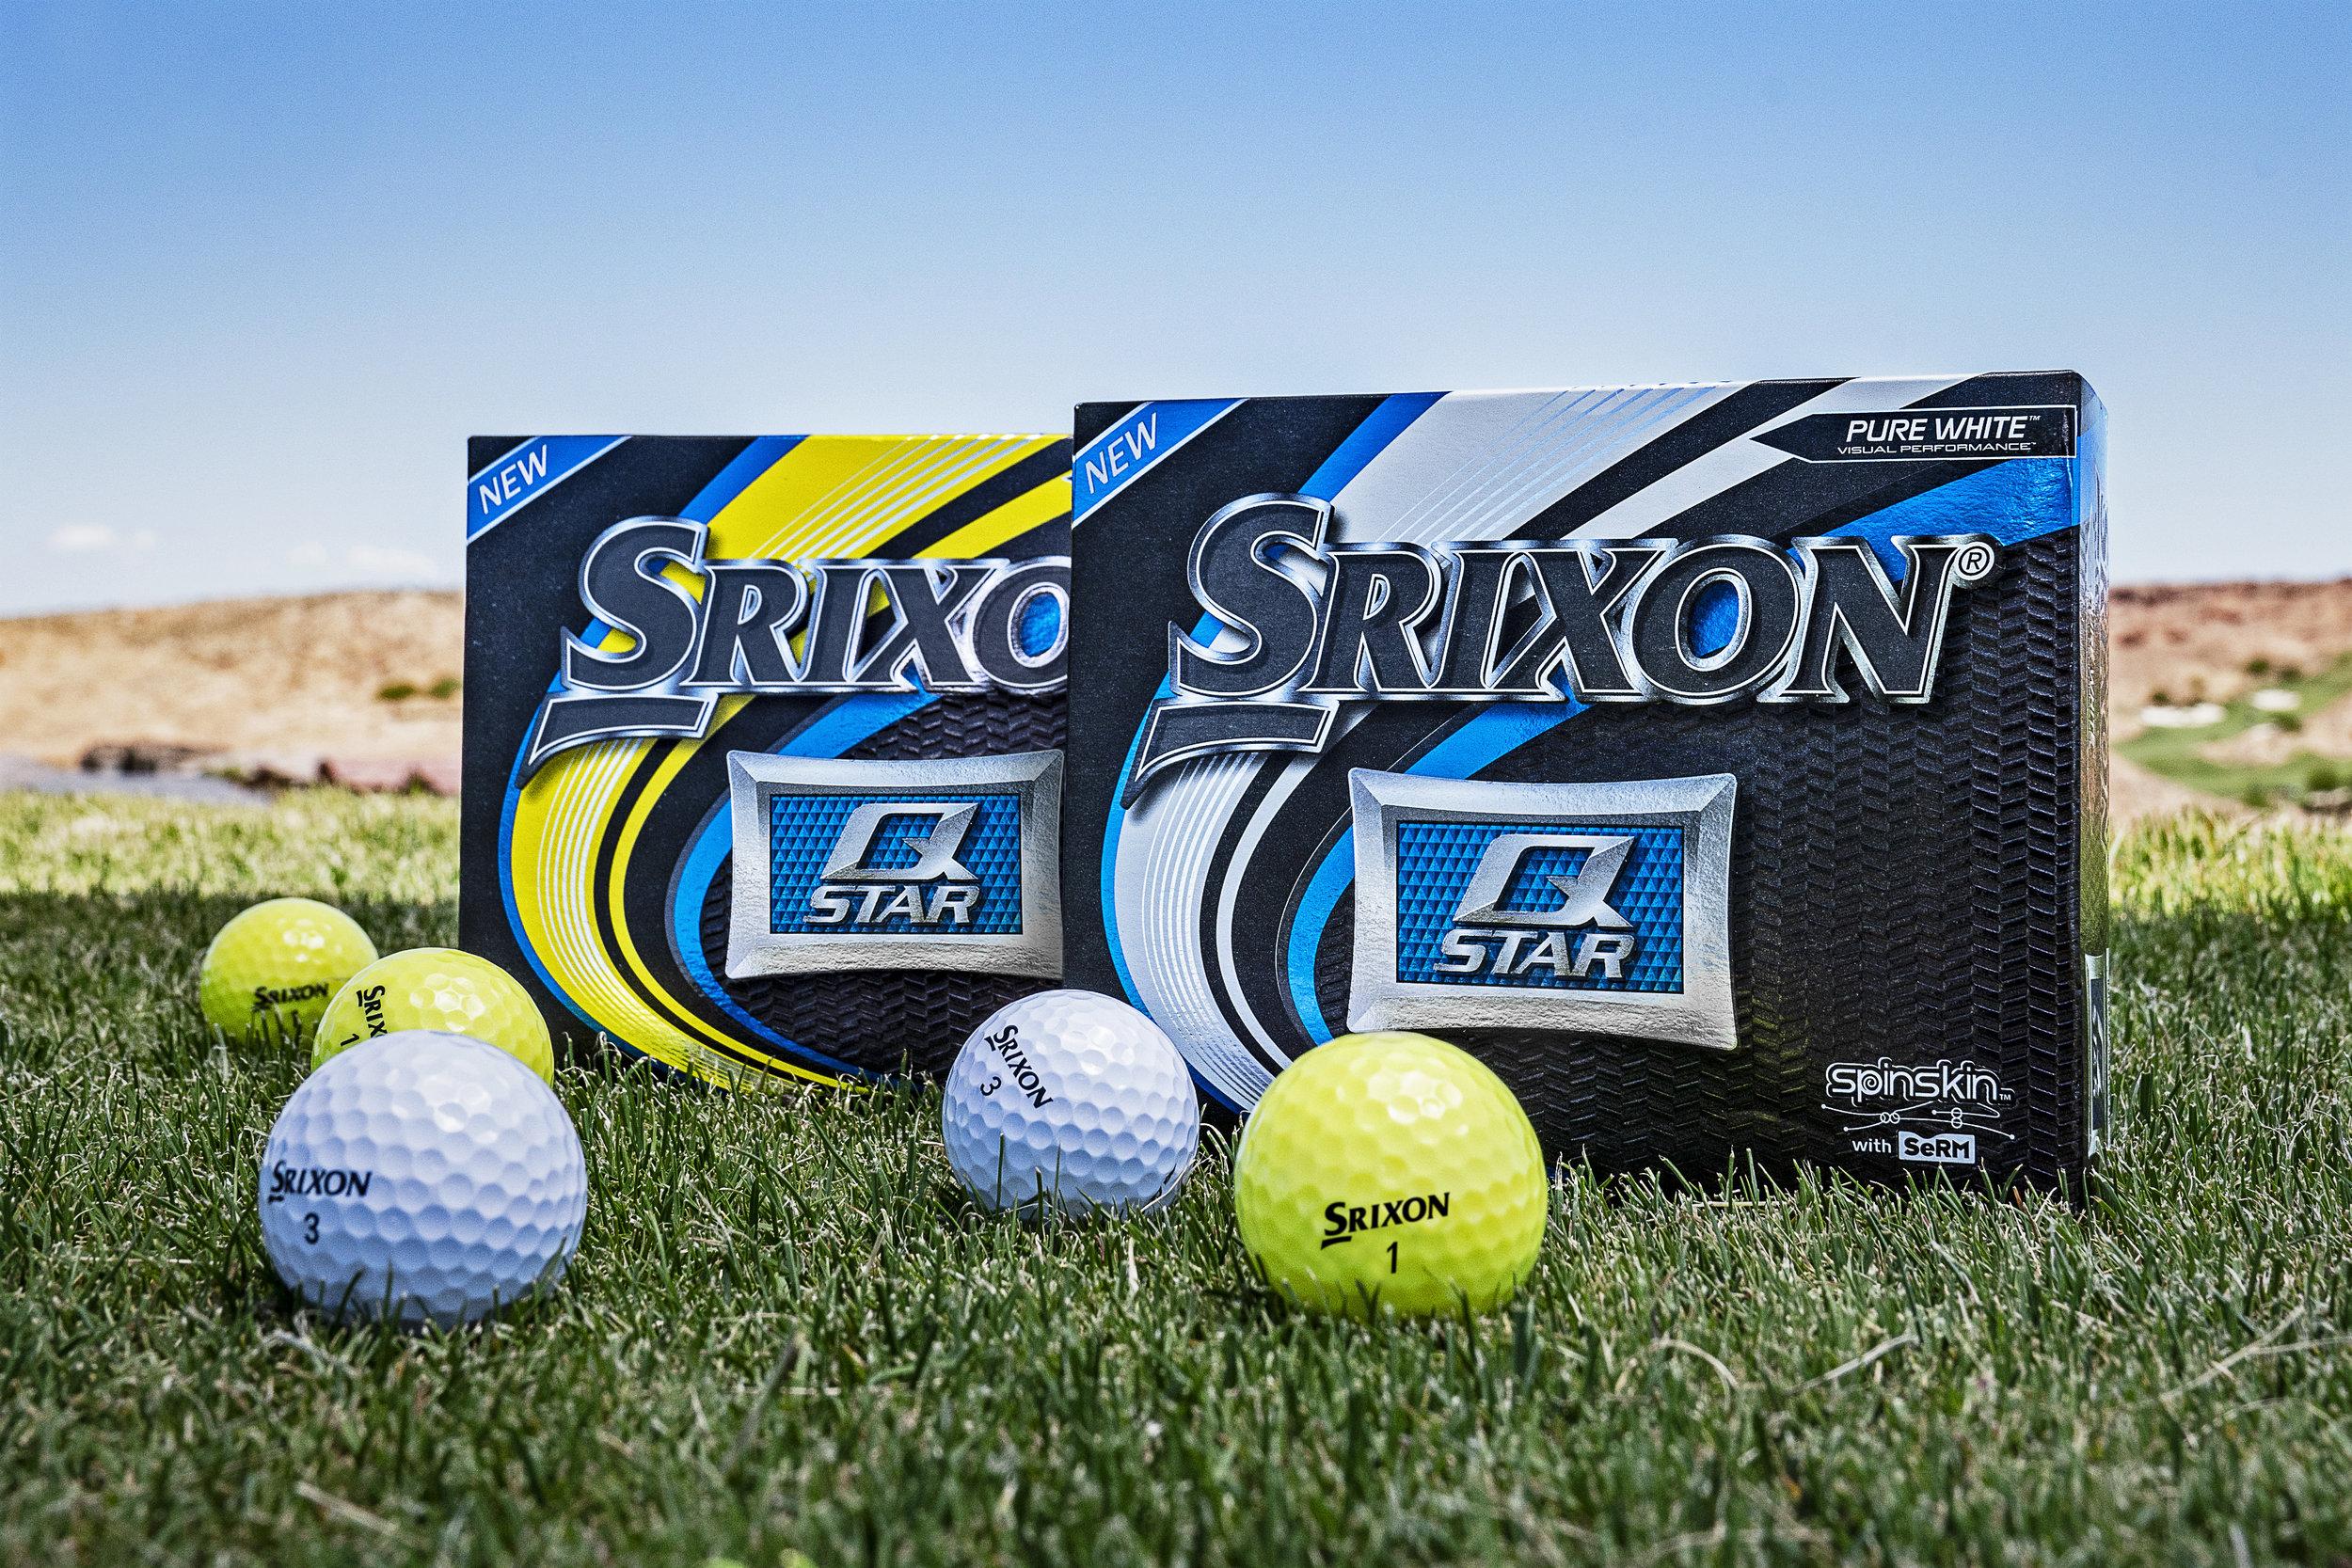 Srixon Q-STAR golf balls, fifth generation.